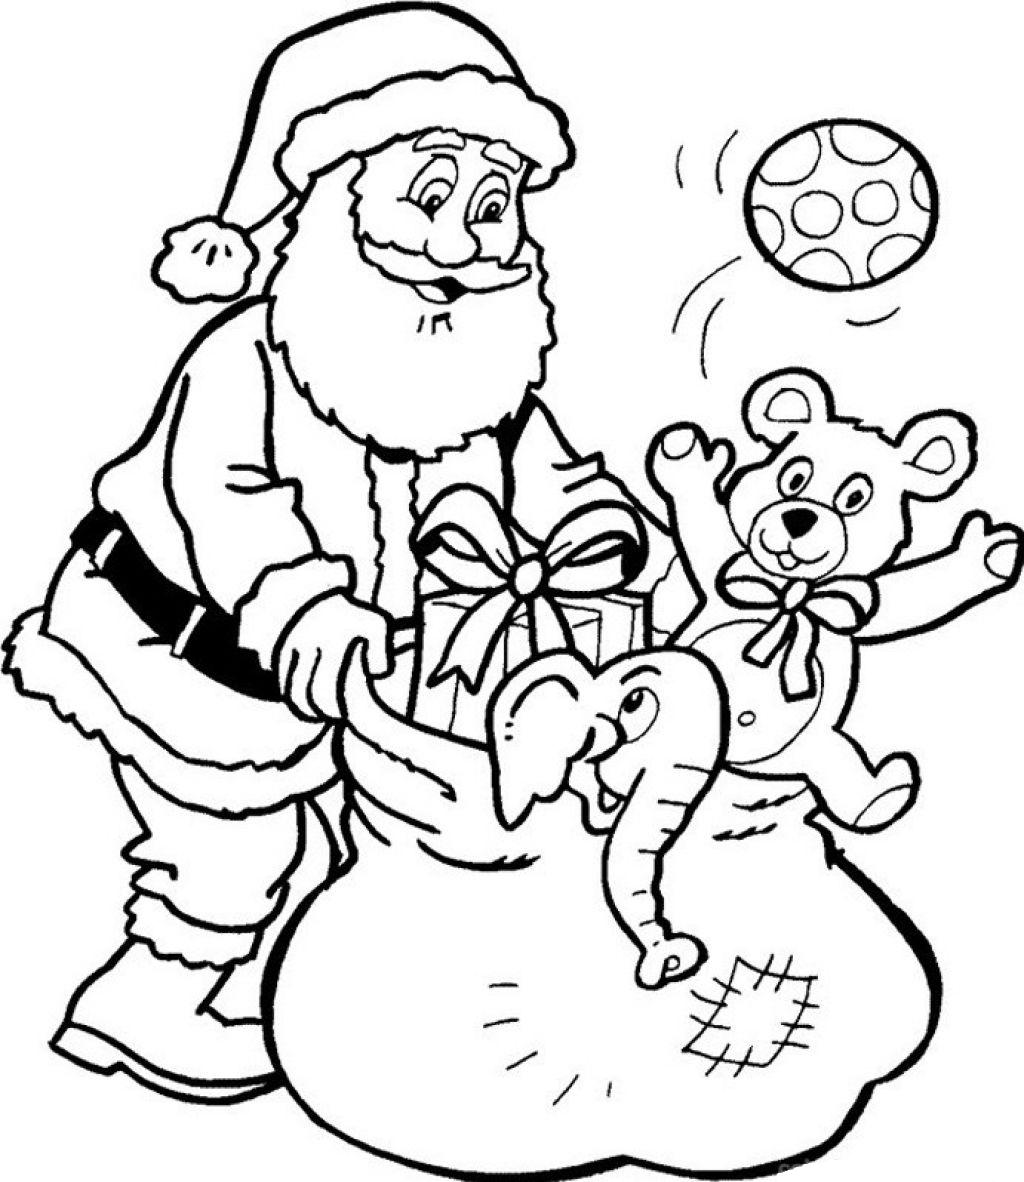 1024x1182 Santa Claus Face With No Beard Coloring Page 331597